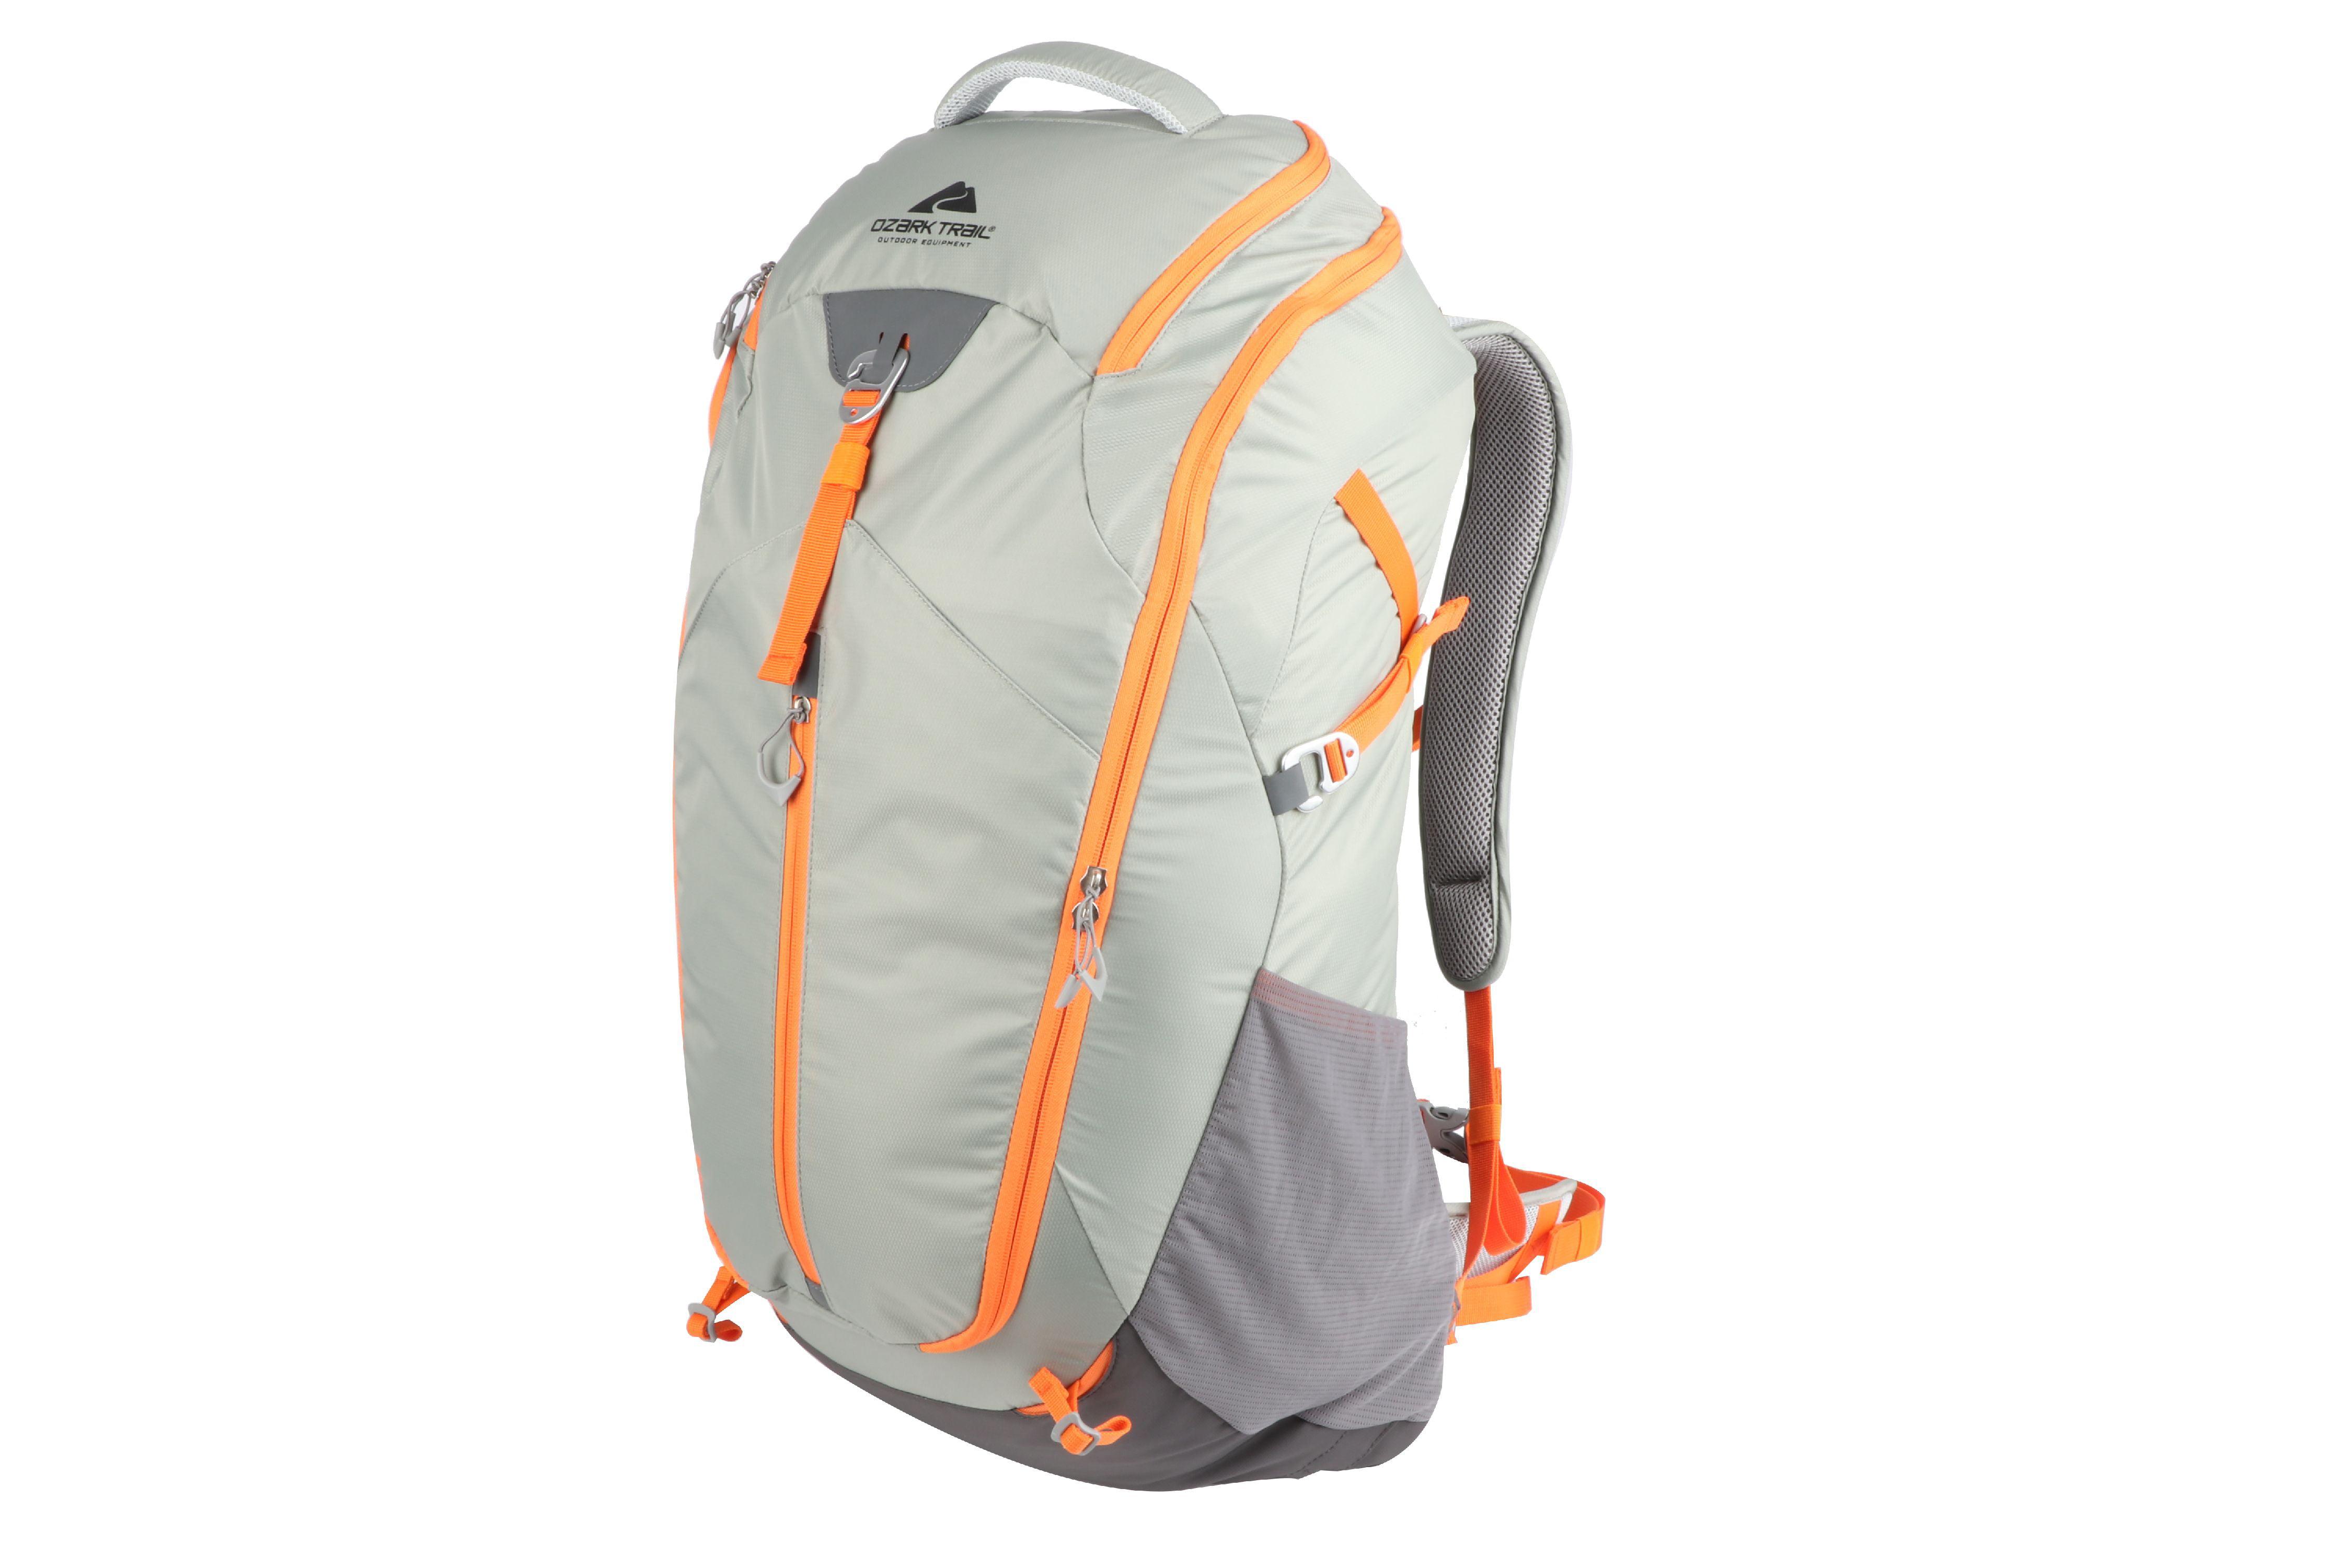 3dbe1f3b901c Ozark Trail Lightweight Hydration Compatible Hiking Backpack 40L ...